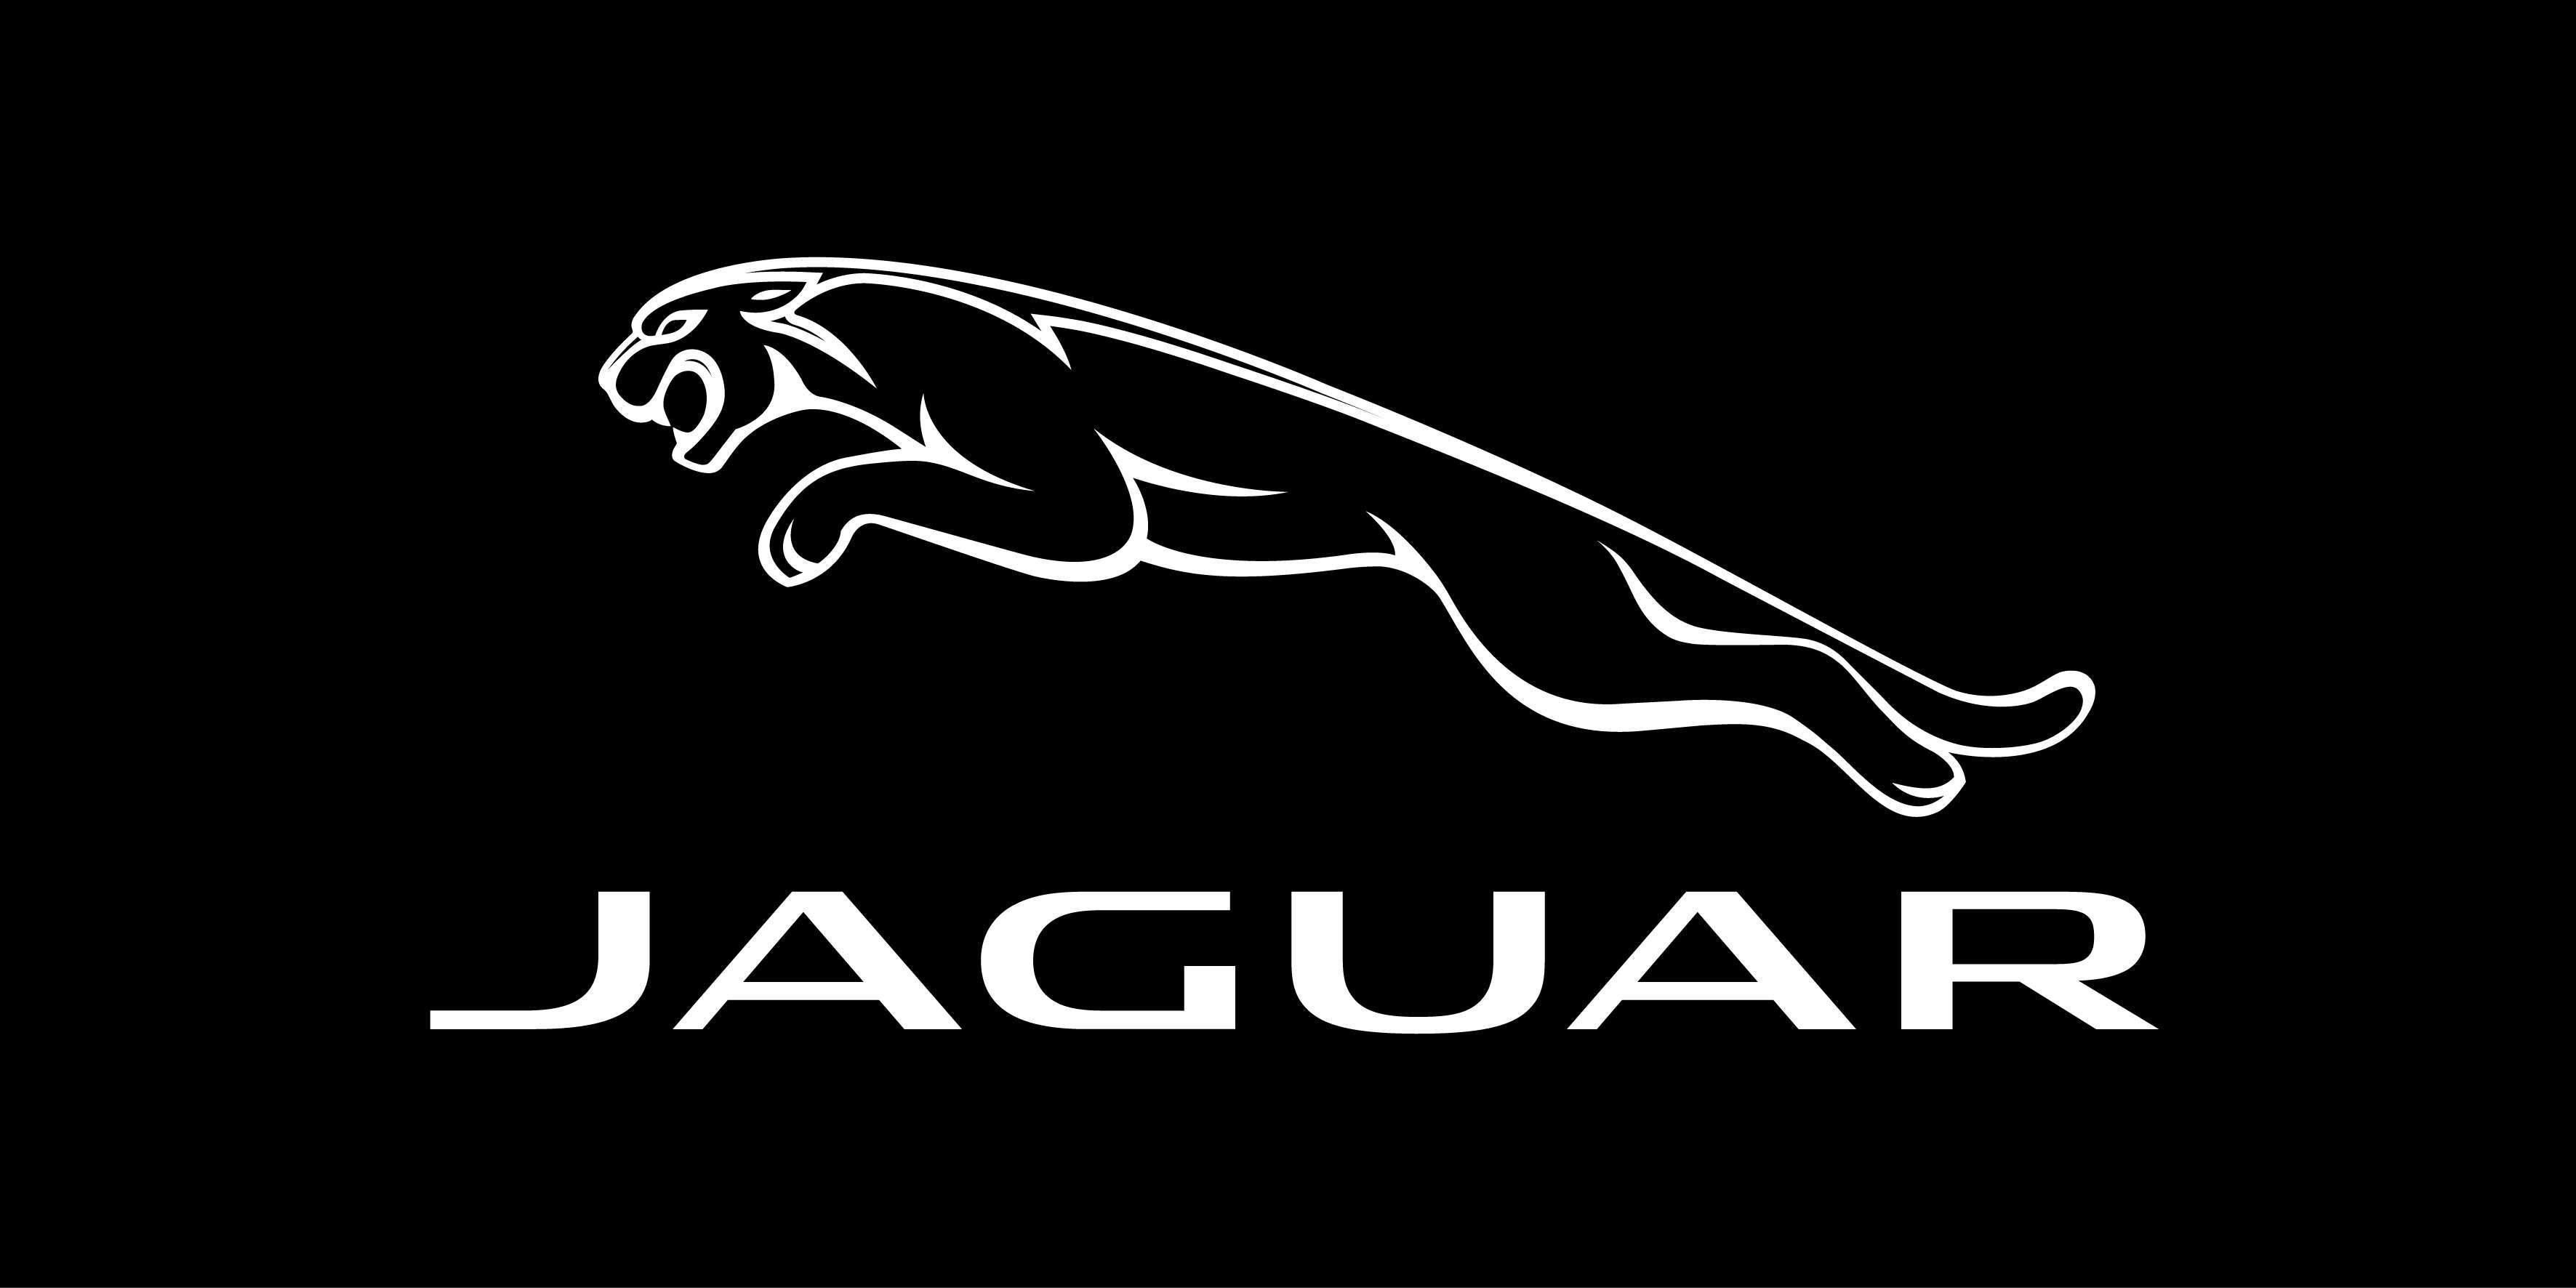 JAGUAR LOGO jaguar logo 176249  freehdwallpaperscom